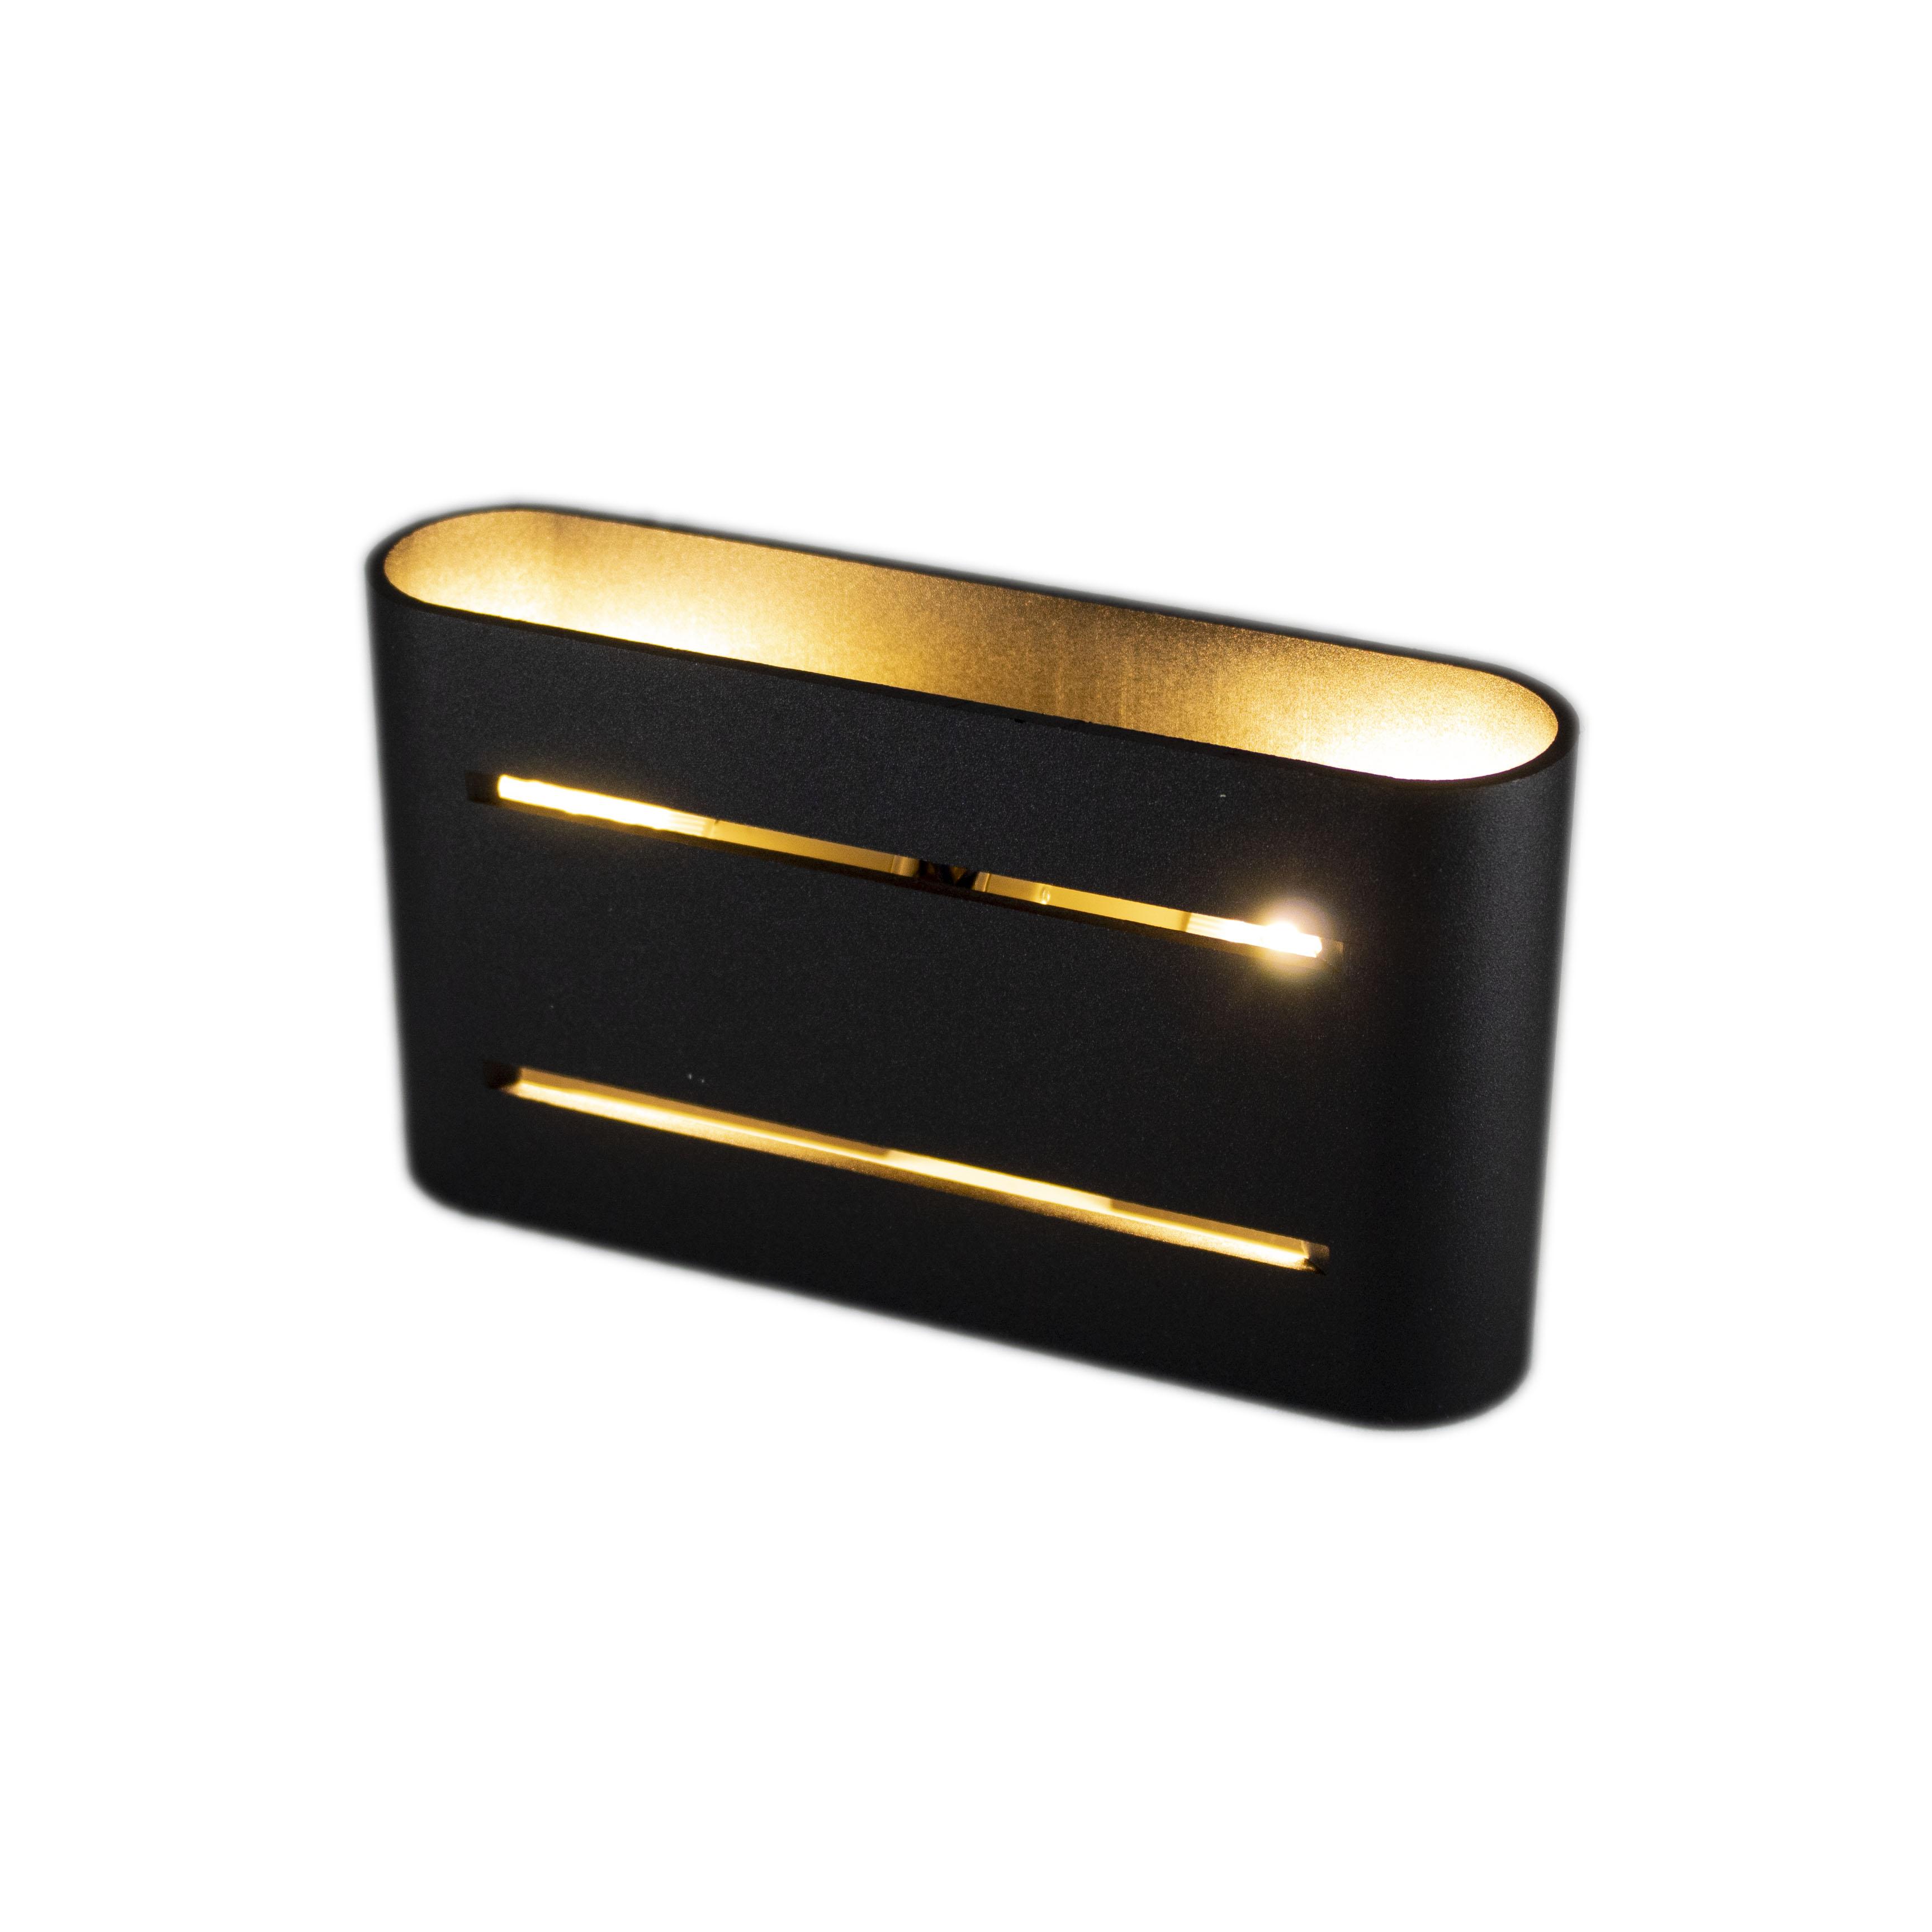 Led wandlamp zwart goud 2 keer G9 fitting - ip20 - lamp aan